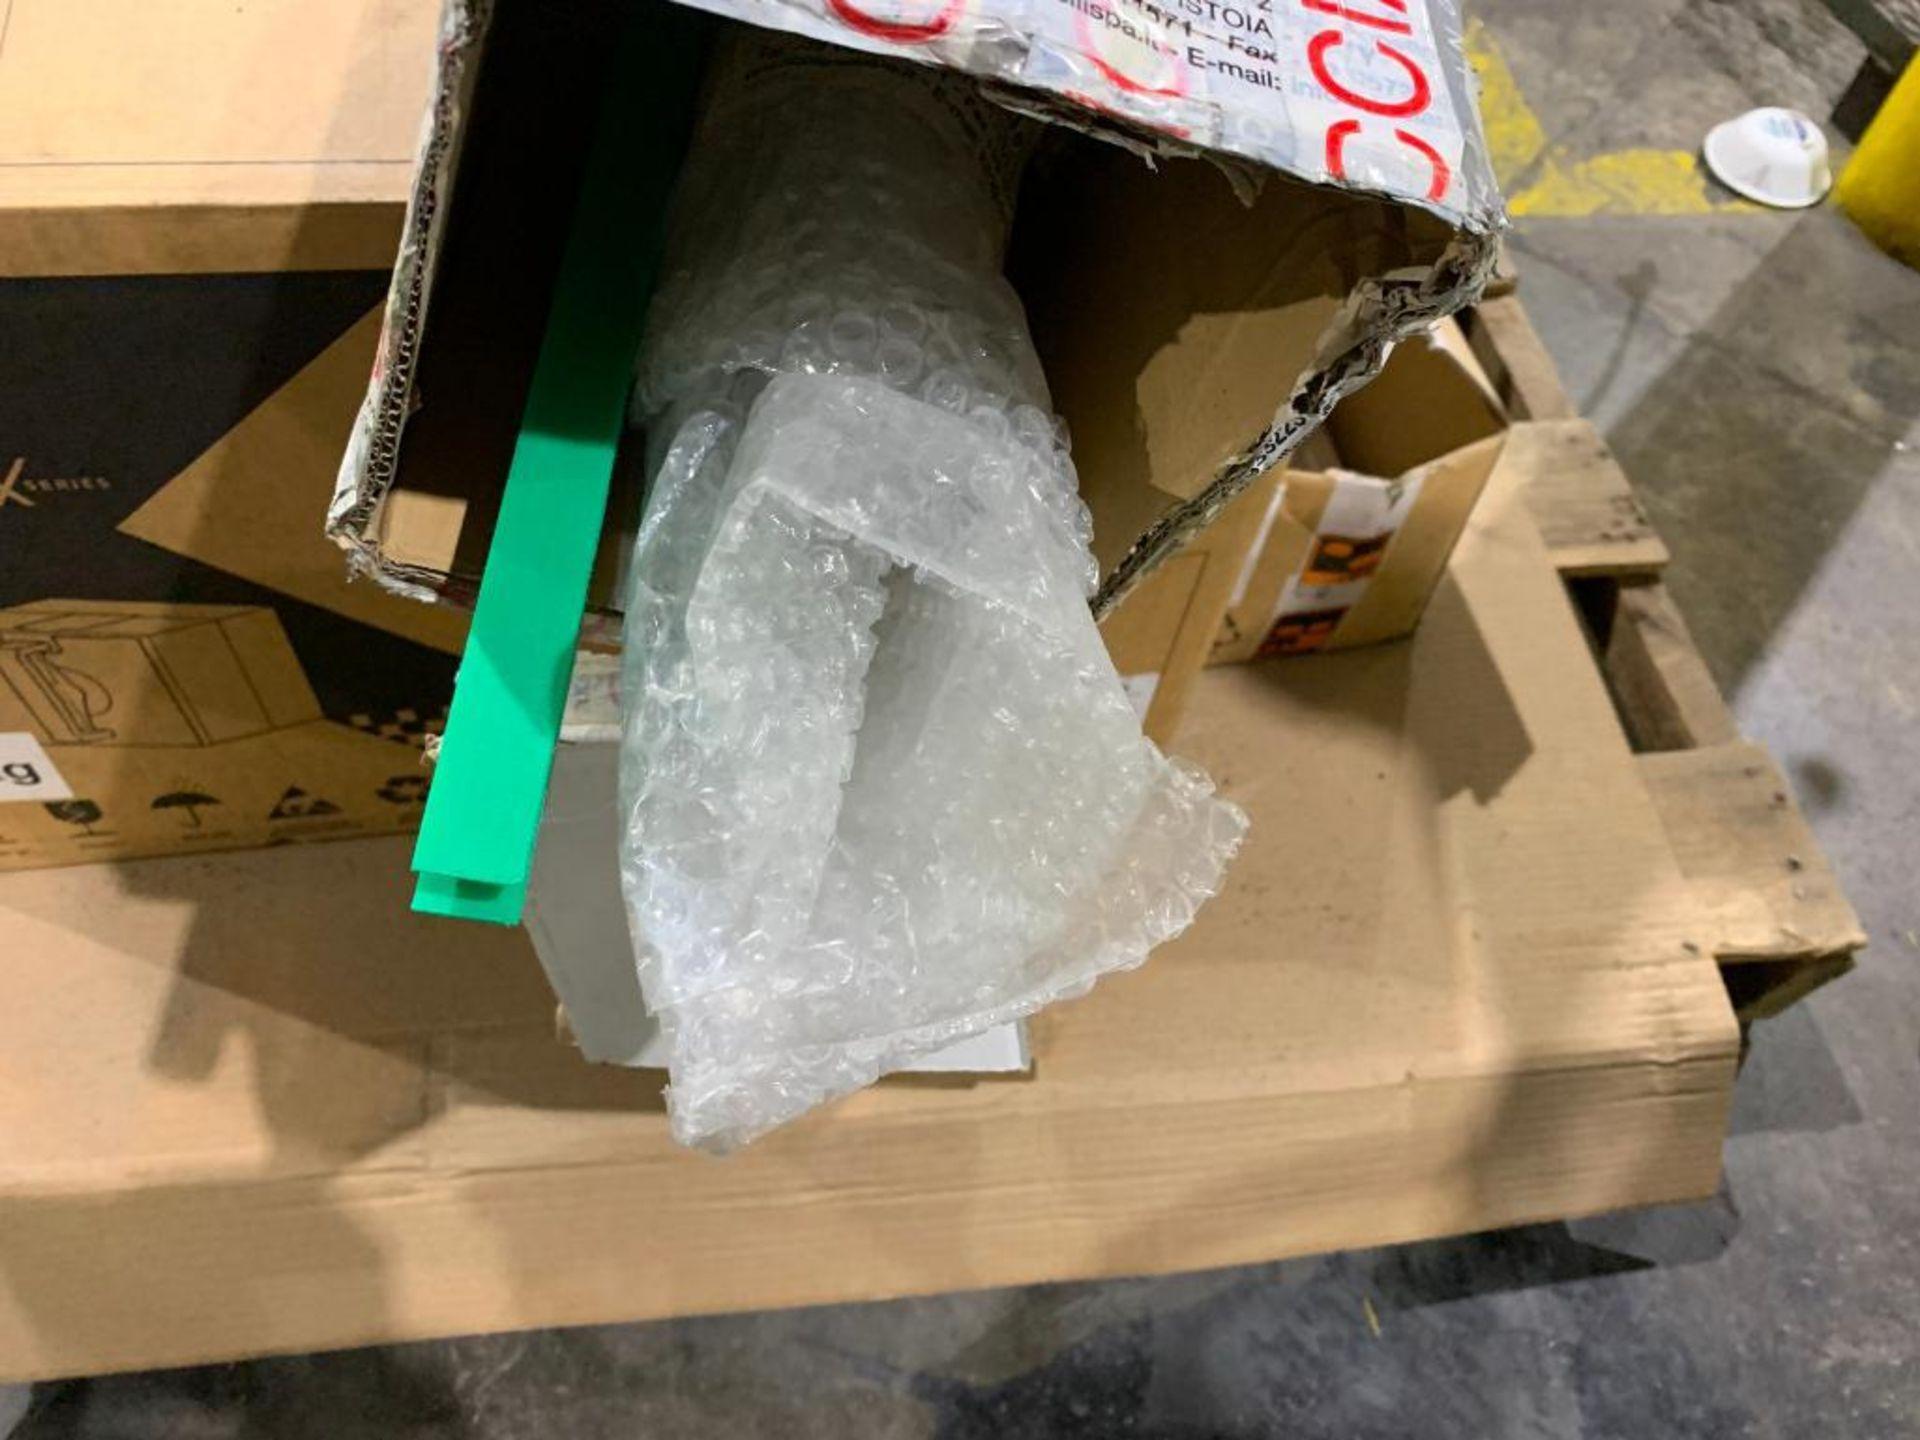 2010 Ricciarelli long goods horizontal flow wrapper - Image 72 of 79